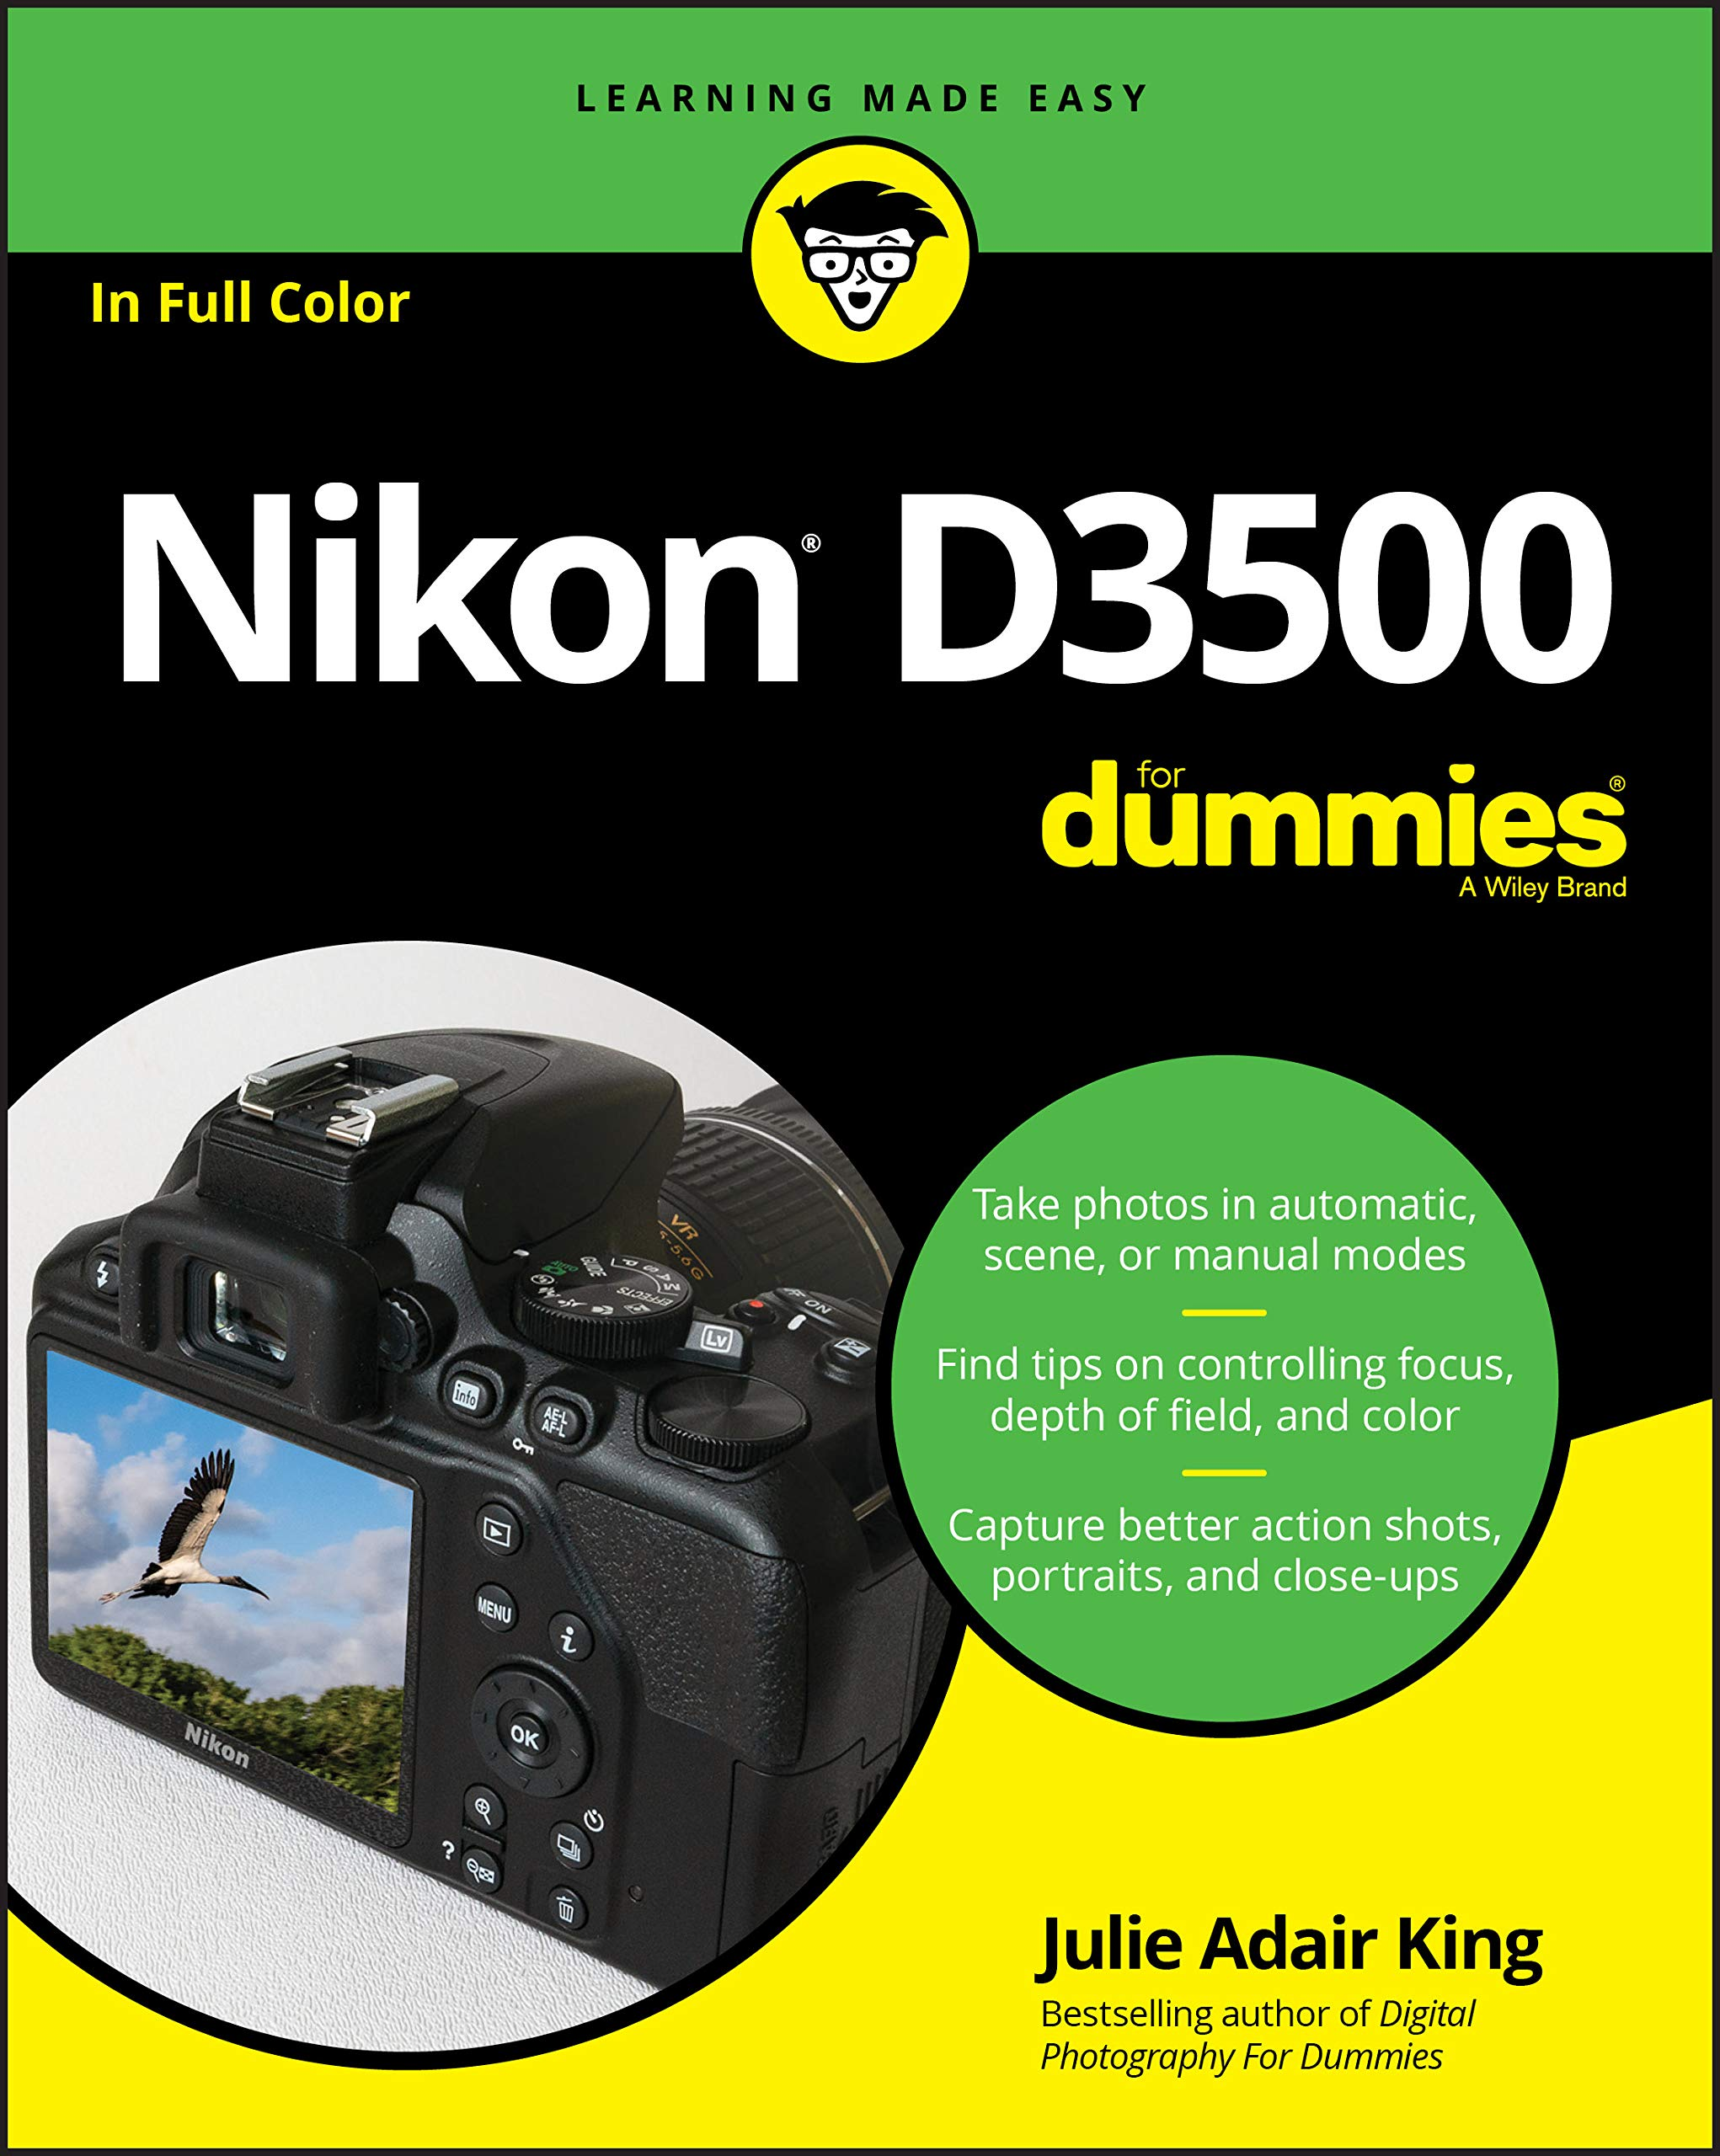 King, J: Nikon D3500 For Dummies: Amazon.es: King, Julie Adair ...